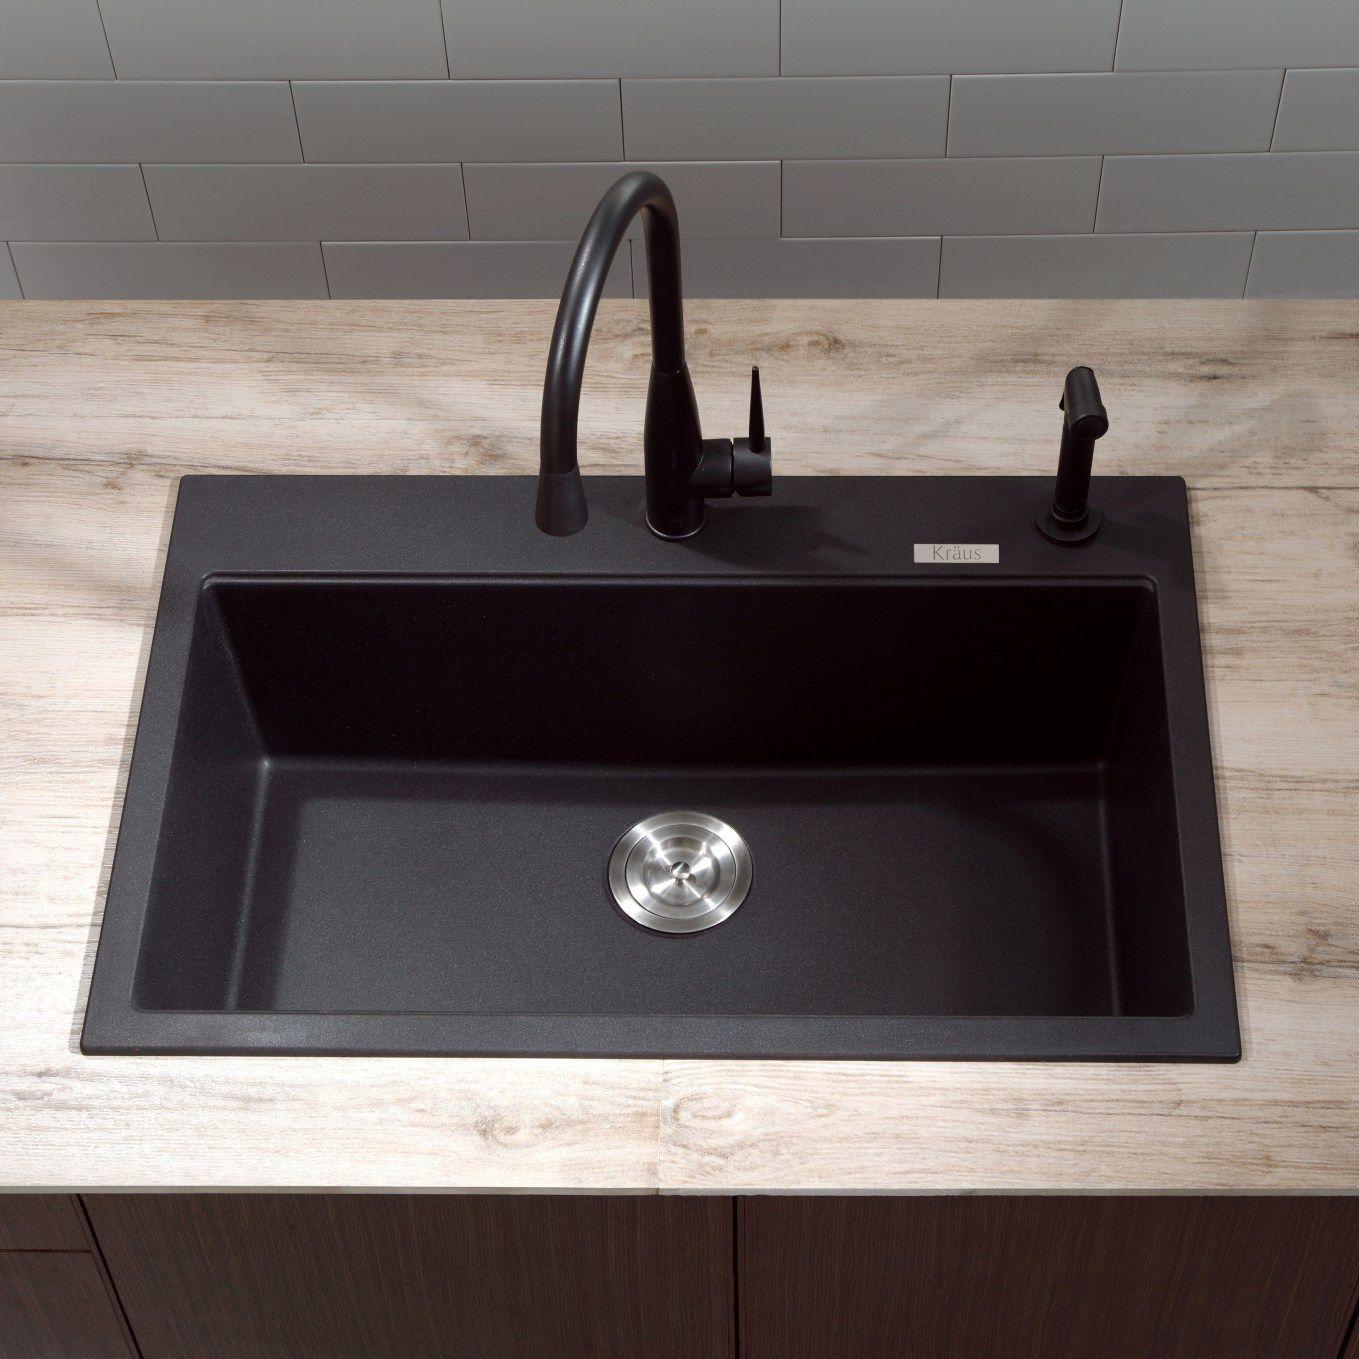 27 Awesome Granite Composite Farmhouse Sink Modern Kitchen Sinks